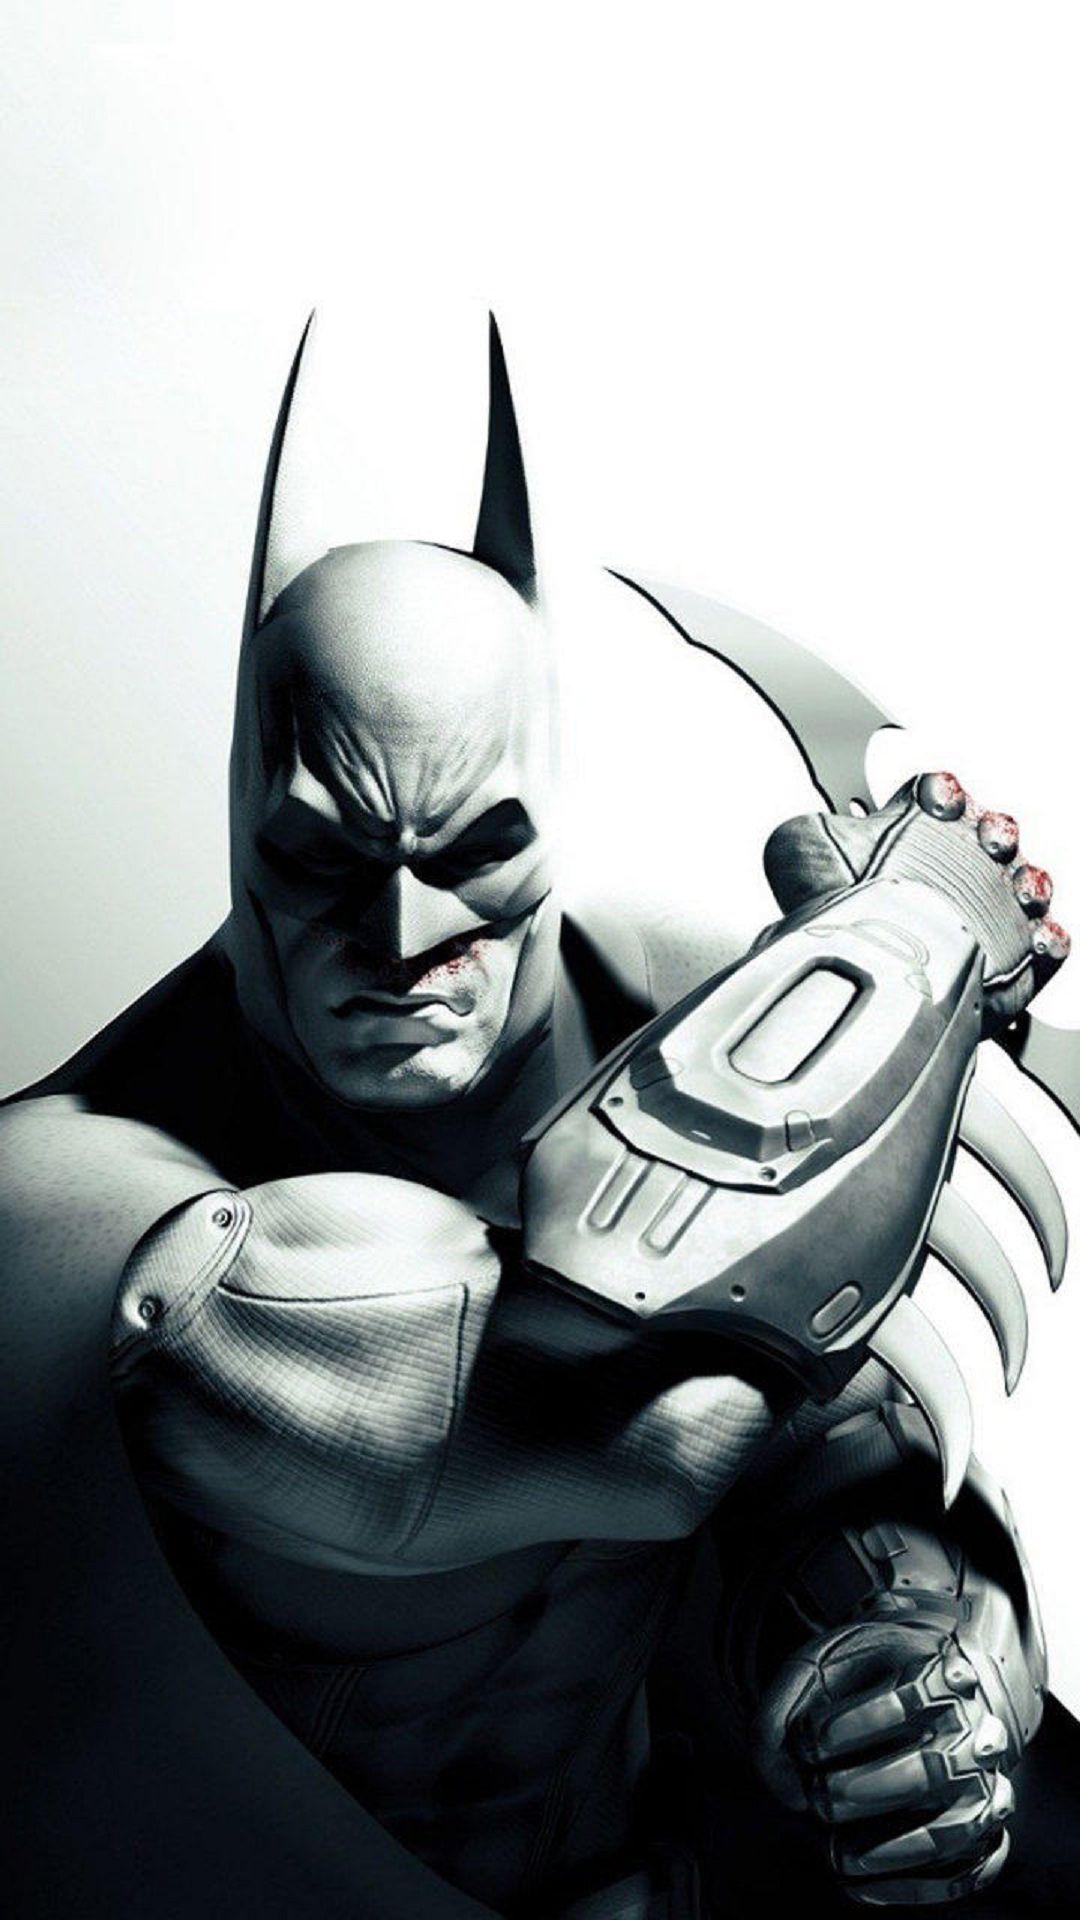 batman dc black art adult monochrome face illustration hero